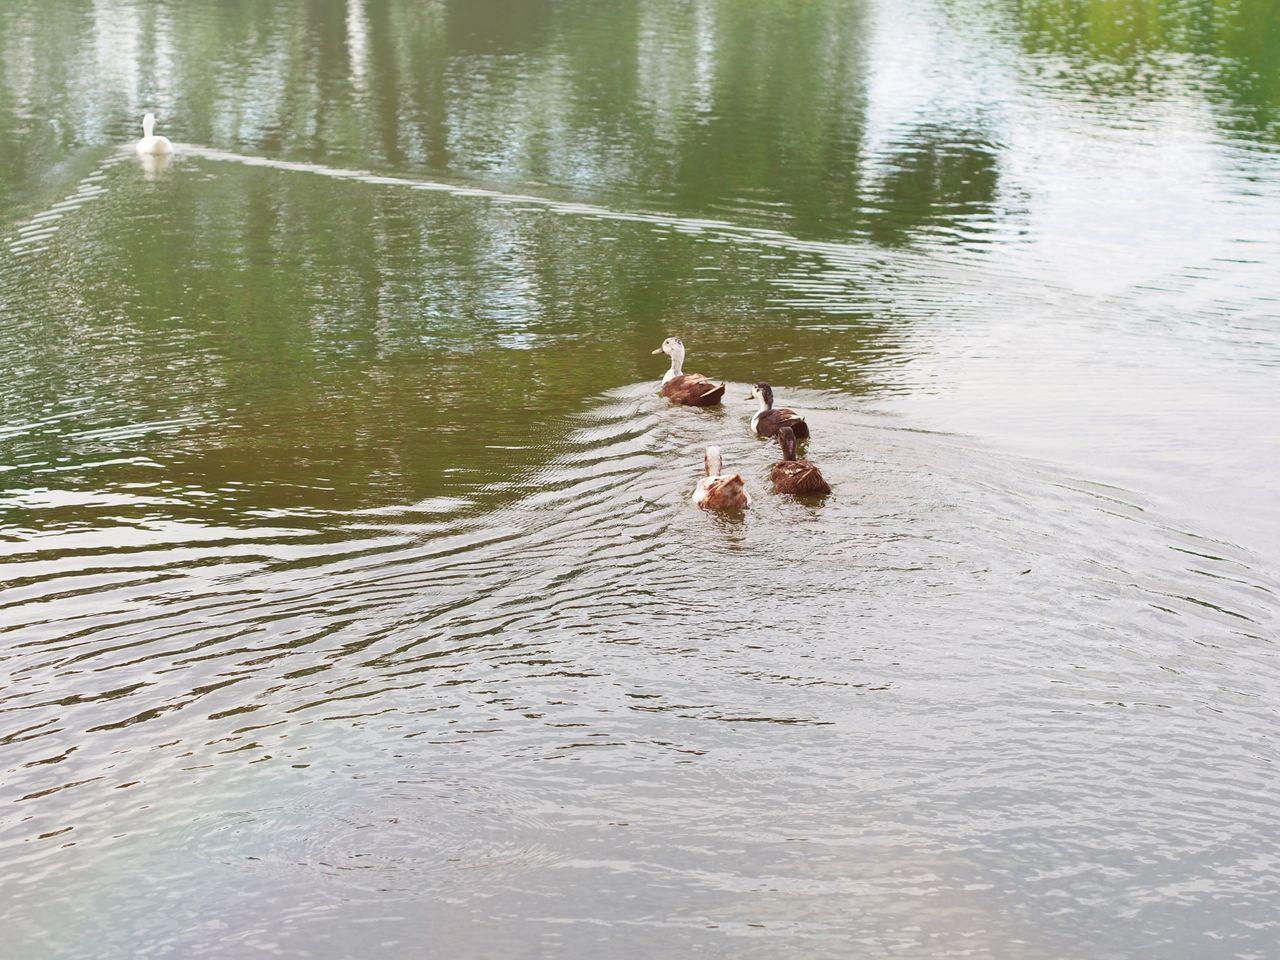 Ducks😄 Animal Themes Water Pets Lake Animal Swimming Animals In The Wild Nature No People Domestic Animals Bird Day Mammal Animal Wildlife Outdoors Hippopotamus Beauty In Nature Swan